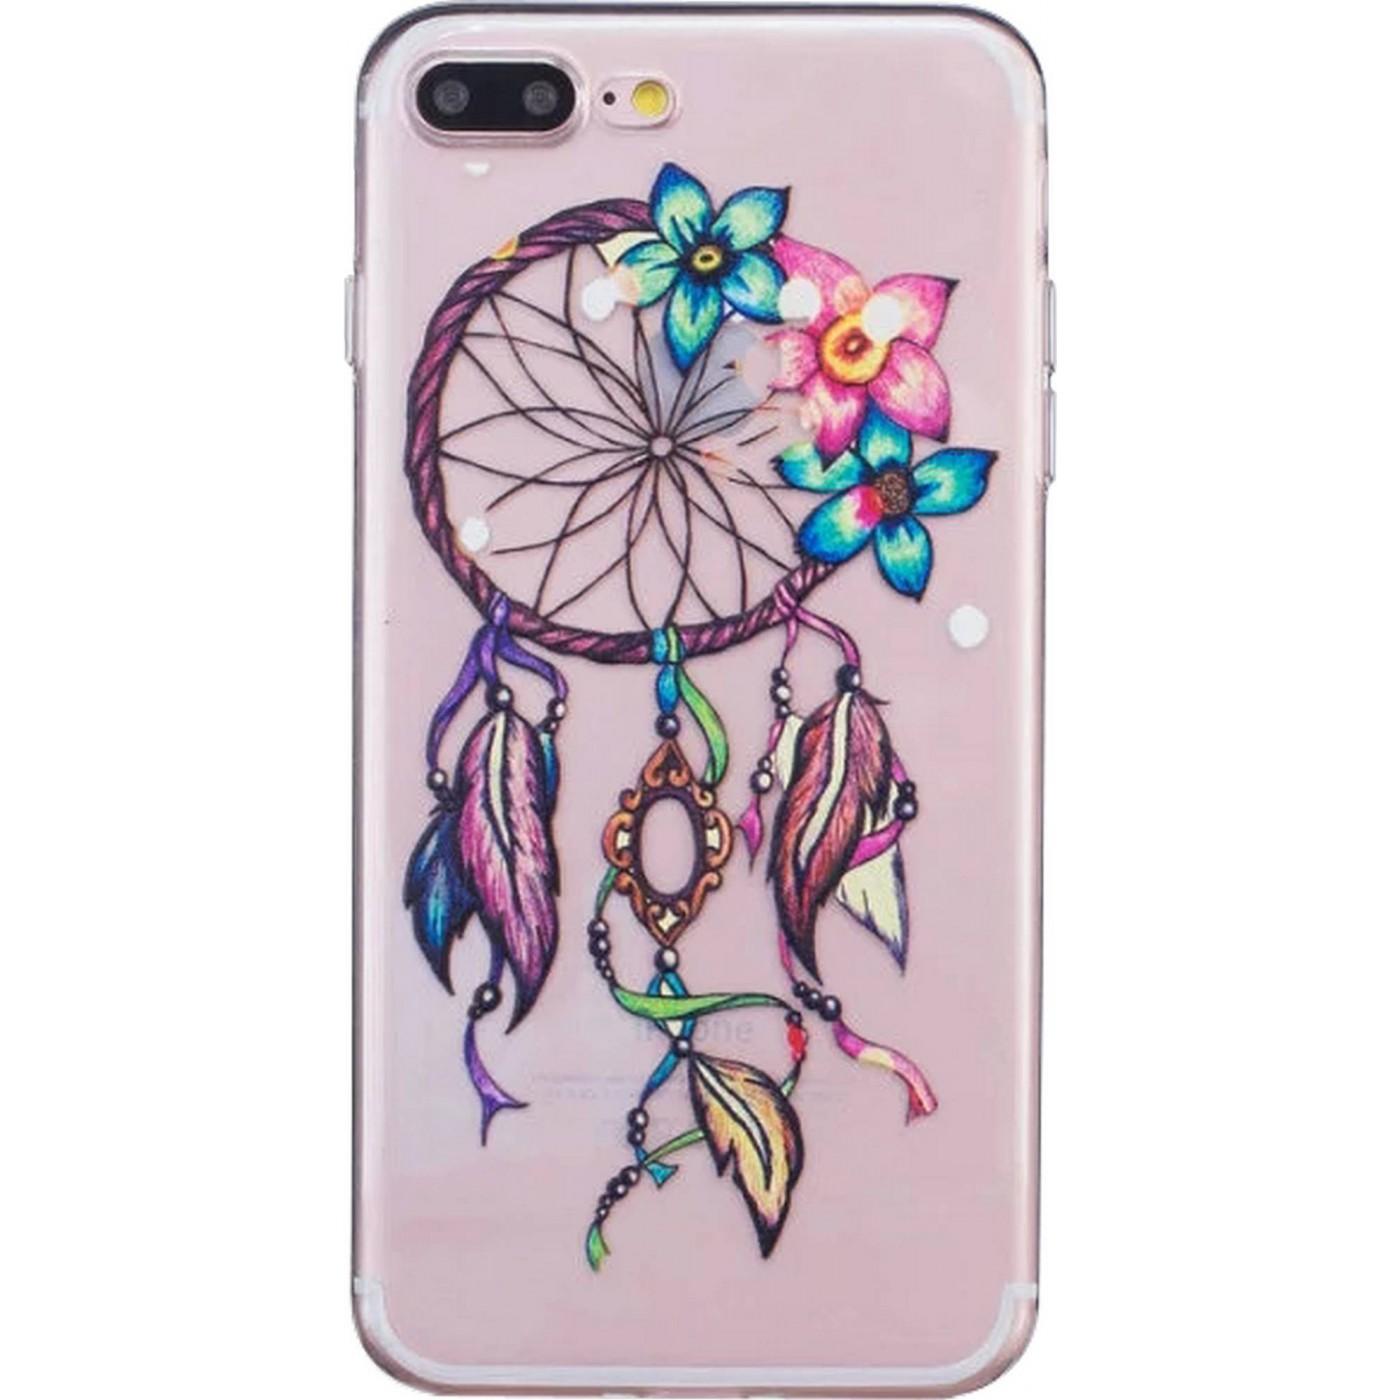 coque iphone 7 plus dreamcatcher